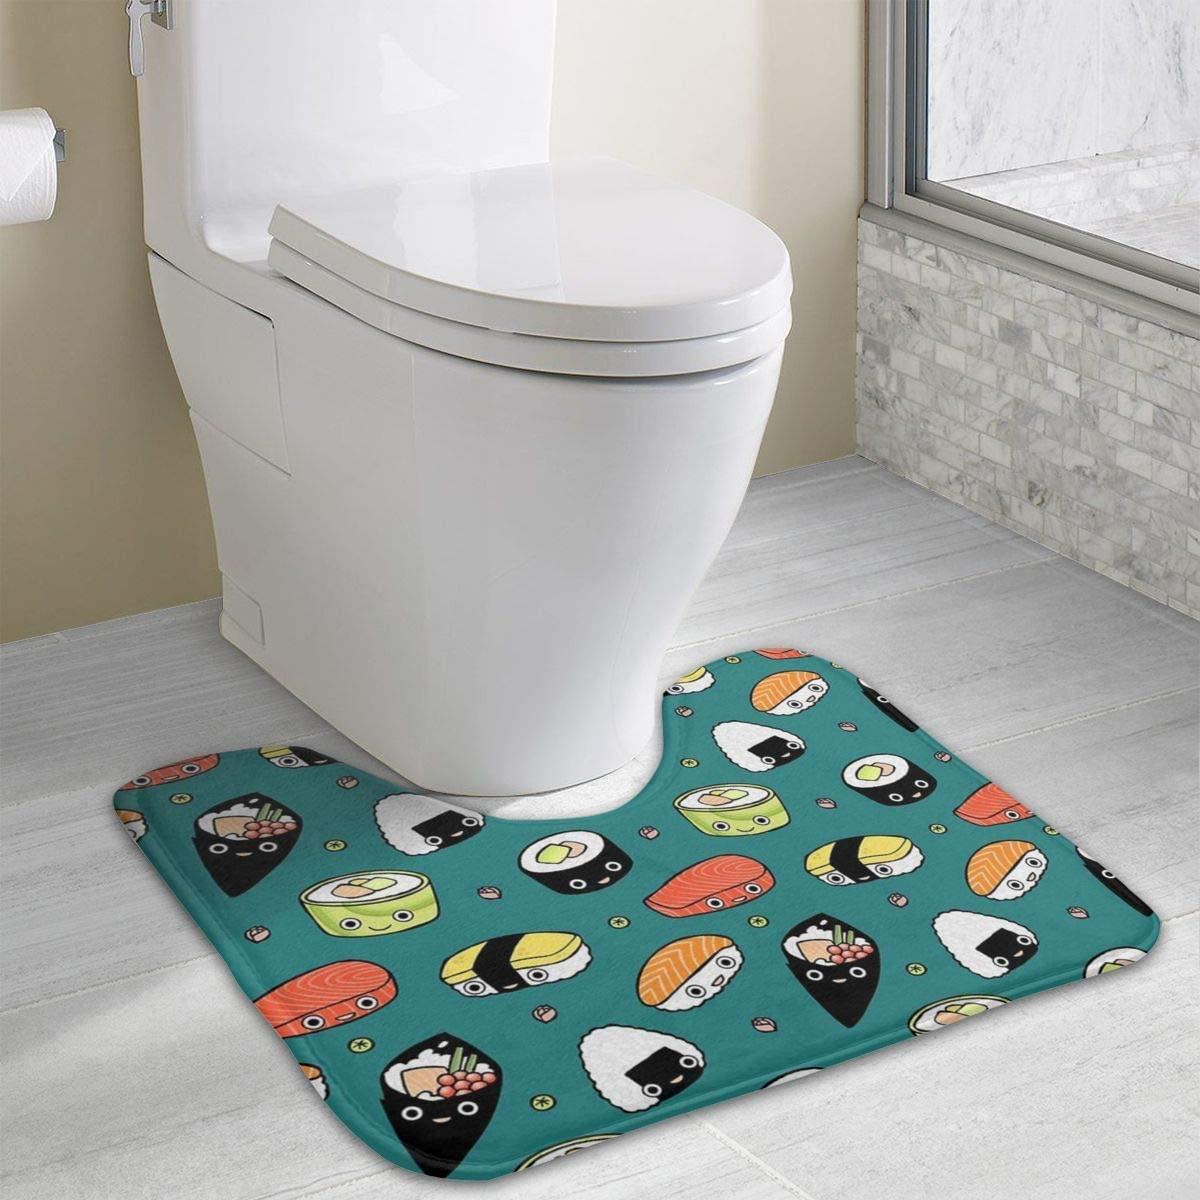 NiYoung Non Skid Memory Foam Toilet Contour Mat Floor Pad Rugs Japan Sushi Kawaii Home Decor Shaggy Rugs Indoor & Outdoor Entrance Rug, Machine-Washable/Quick Dry Doormat